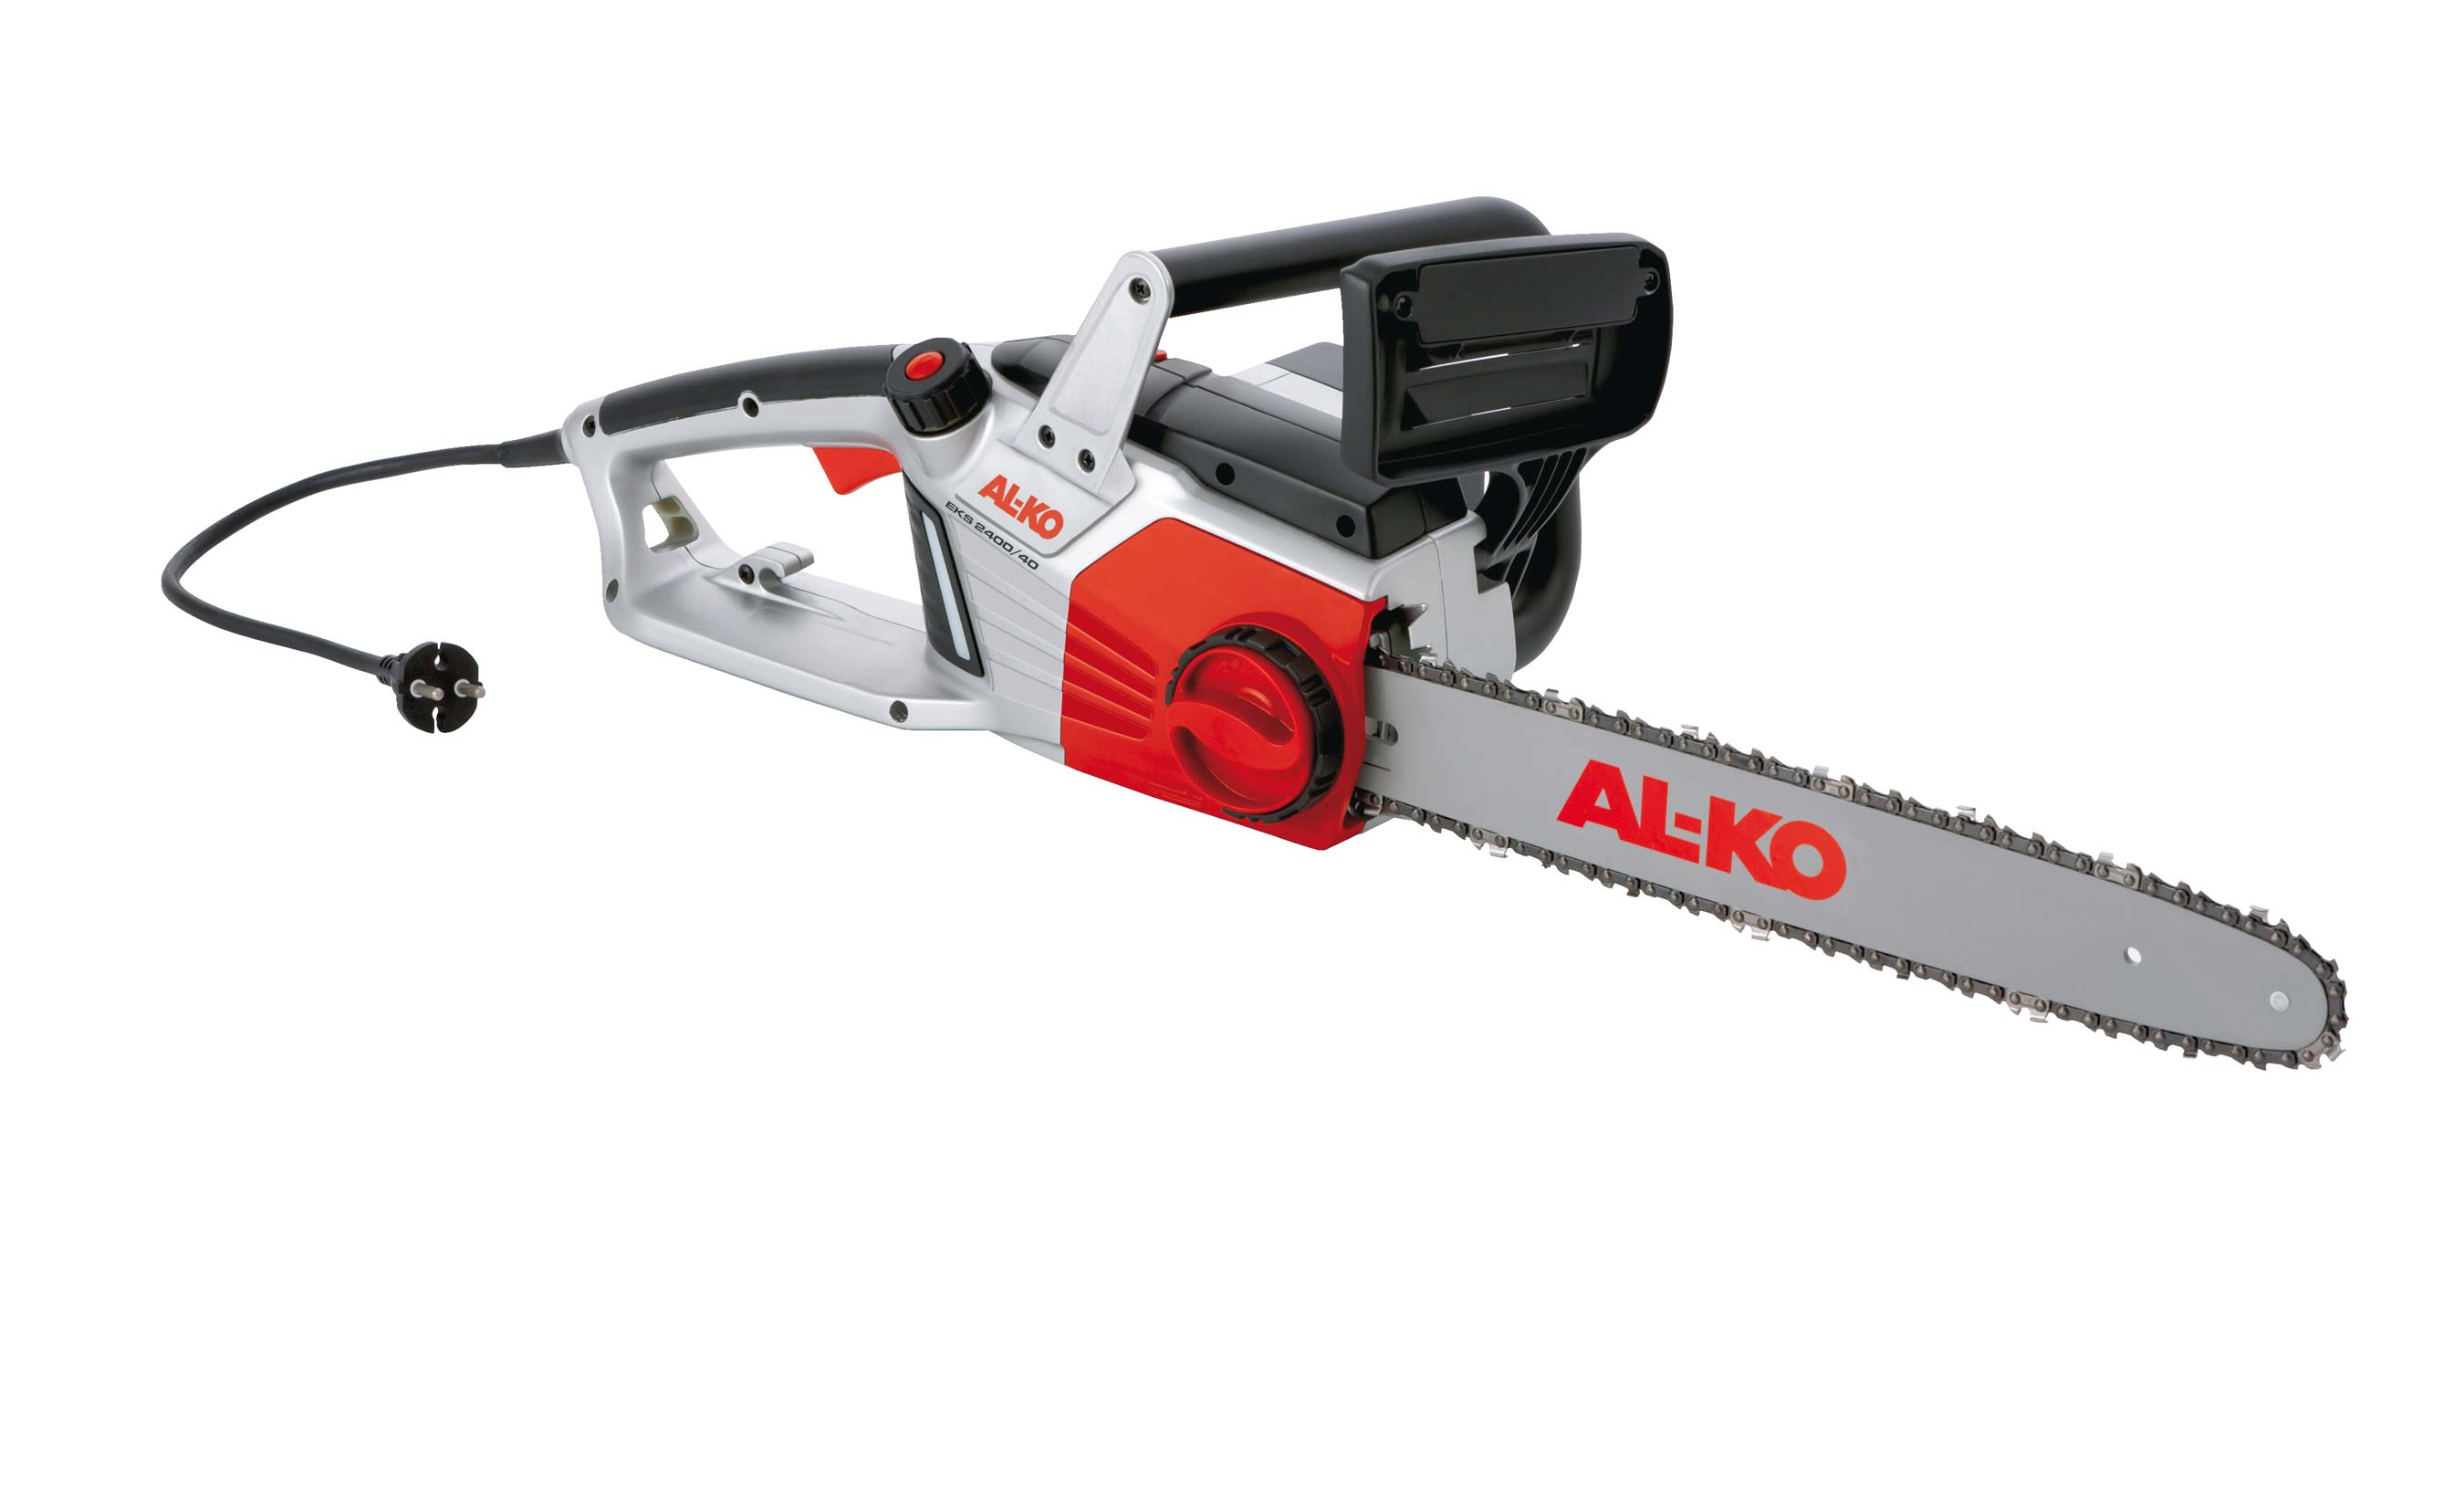 AL-KO Elektro Kettensäge / Motorsäge EKS 2400/40 AB 40cm Bild 1